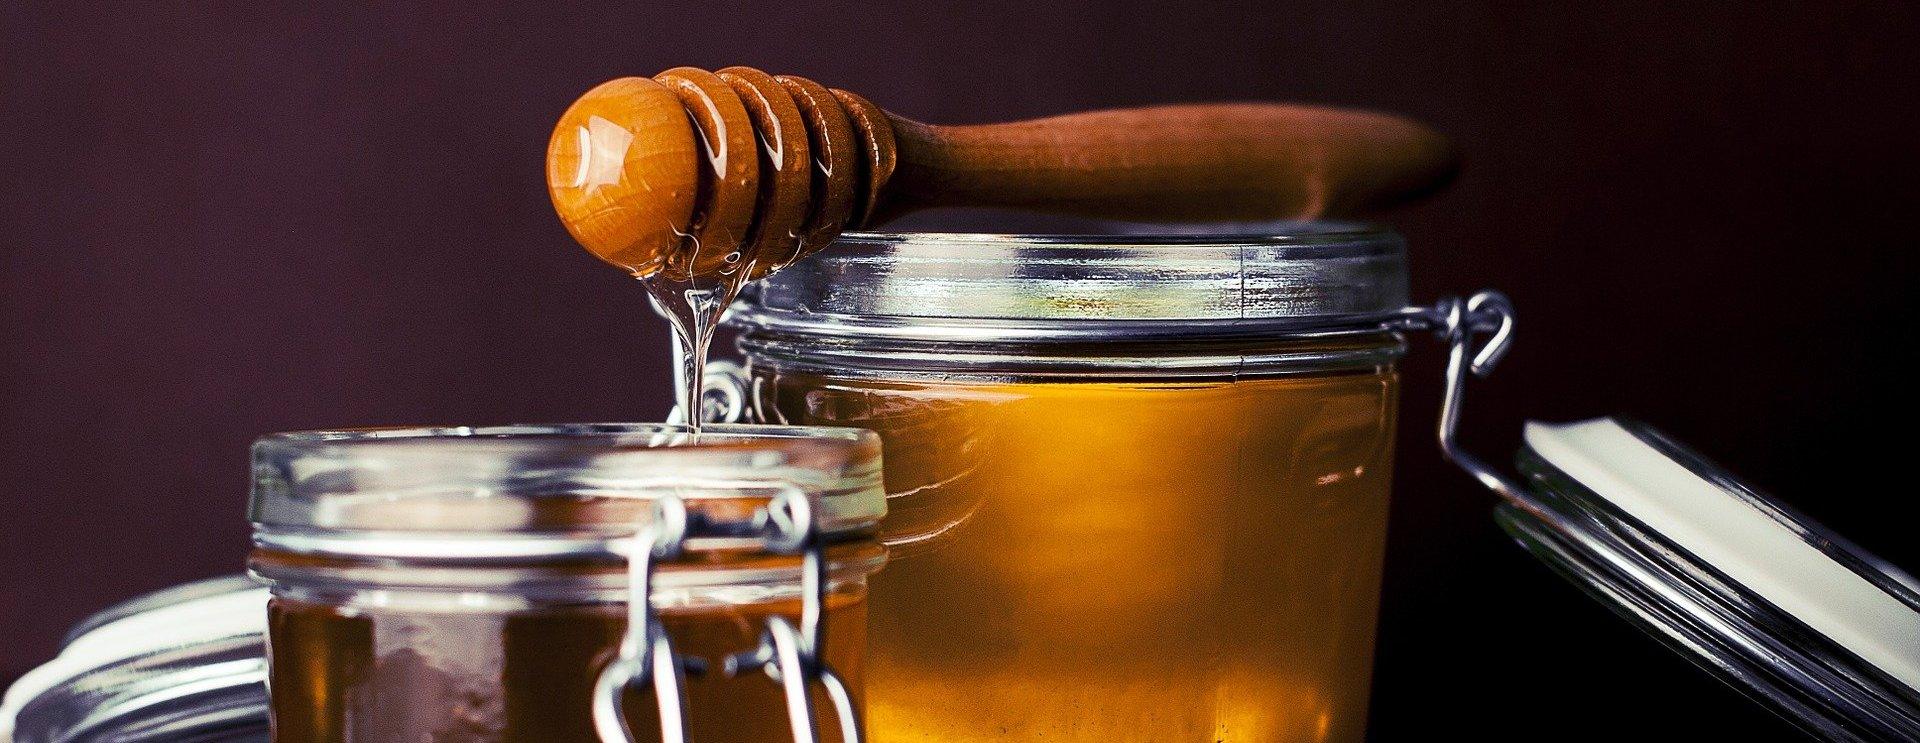 Russian Peroni honey explores foreign markets